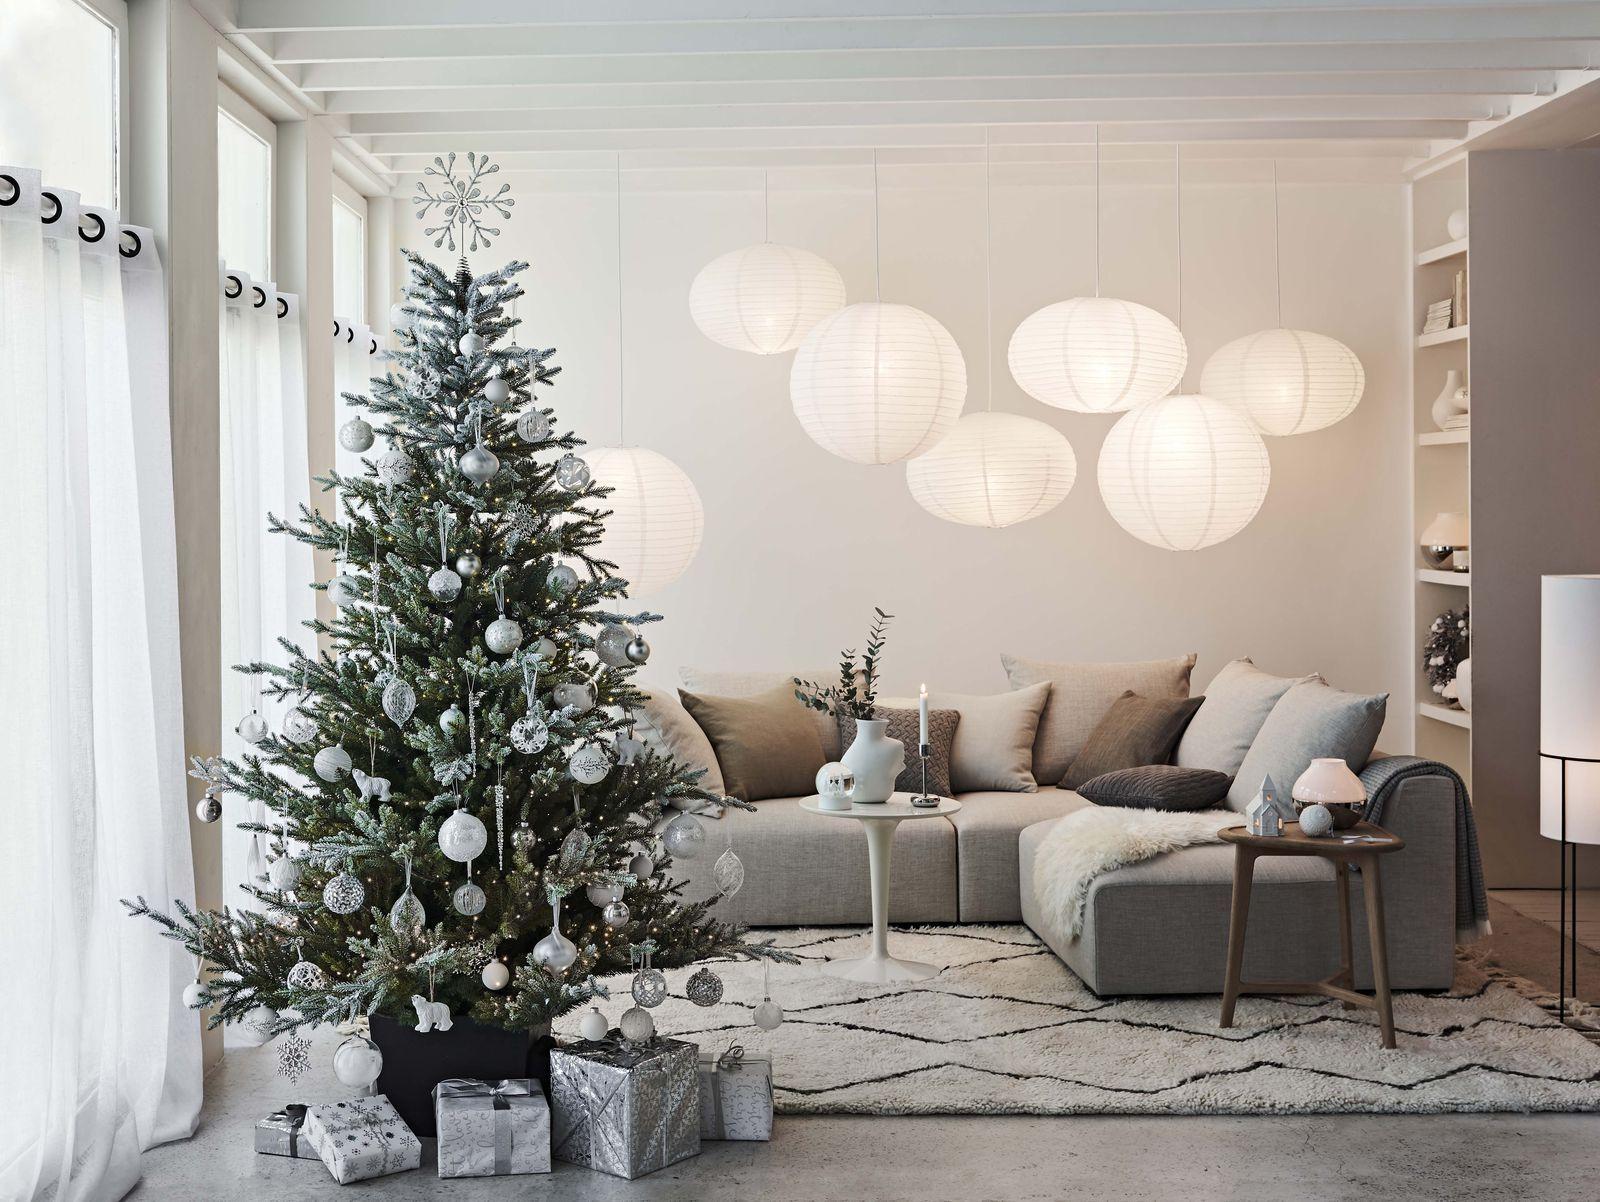 Outdoor Christmas Decorations 2019.John Lewis We Ve Already Begun Planning Christmas 2019